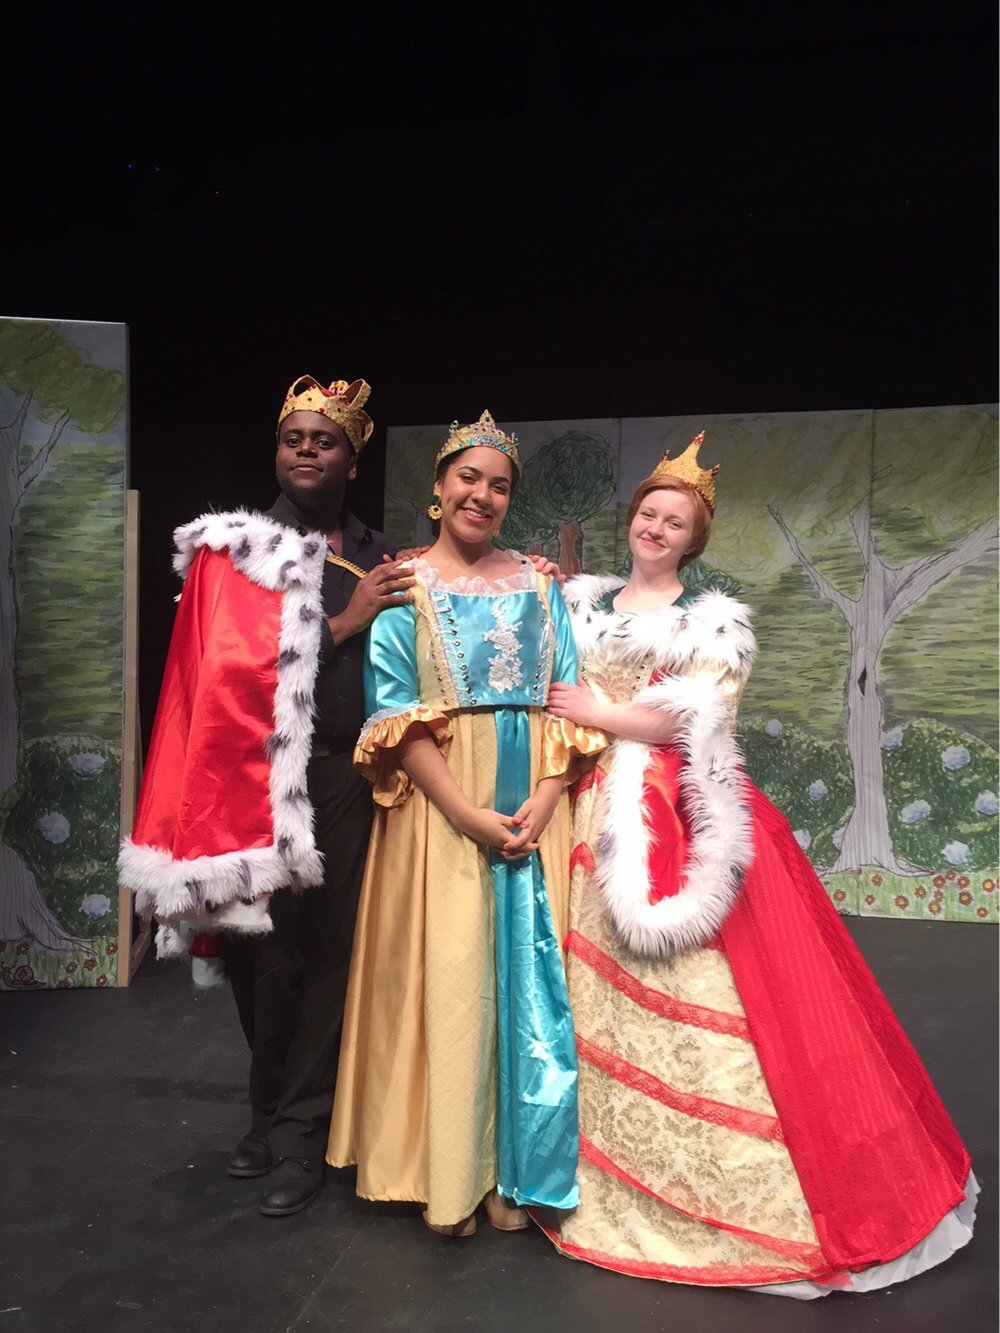 Princess Pricilla and her parents